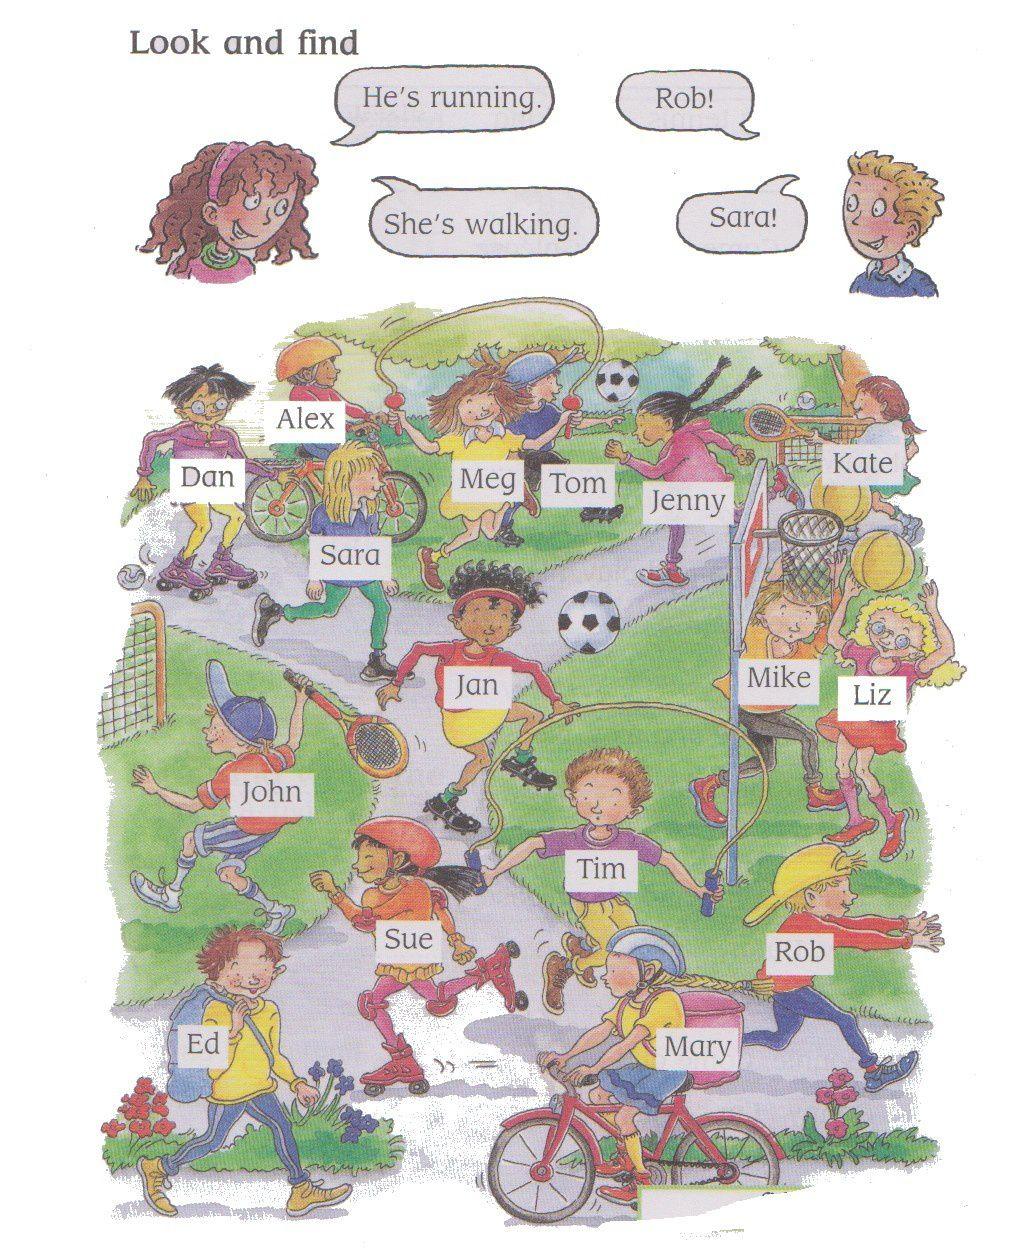 Bien connu English actions: what are they doing? - La Classe de Myli Breizh EA08